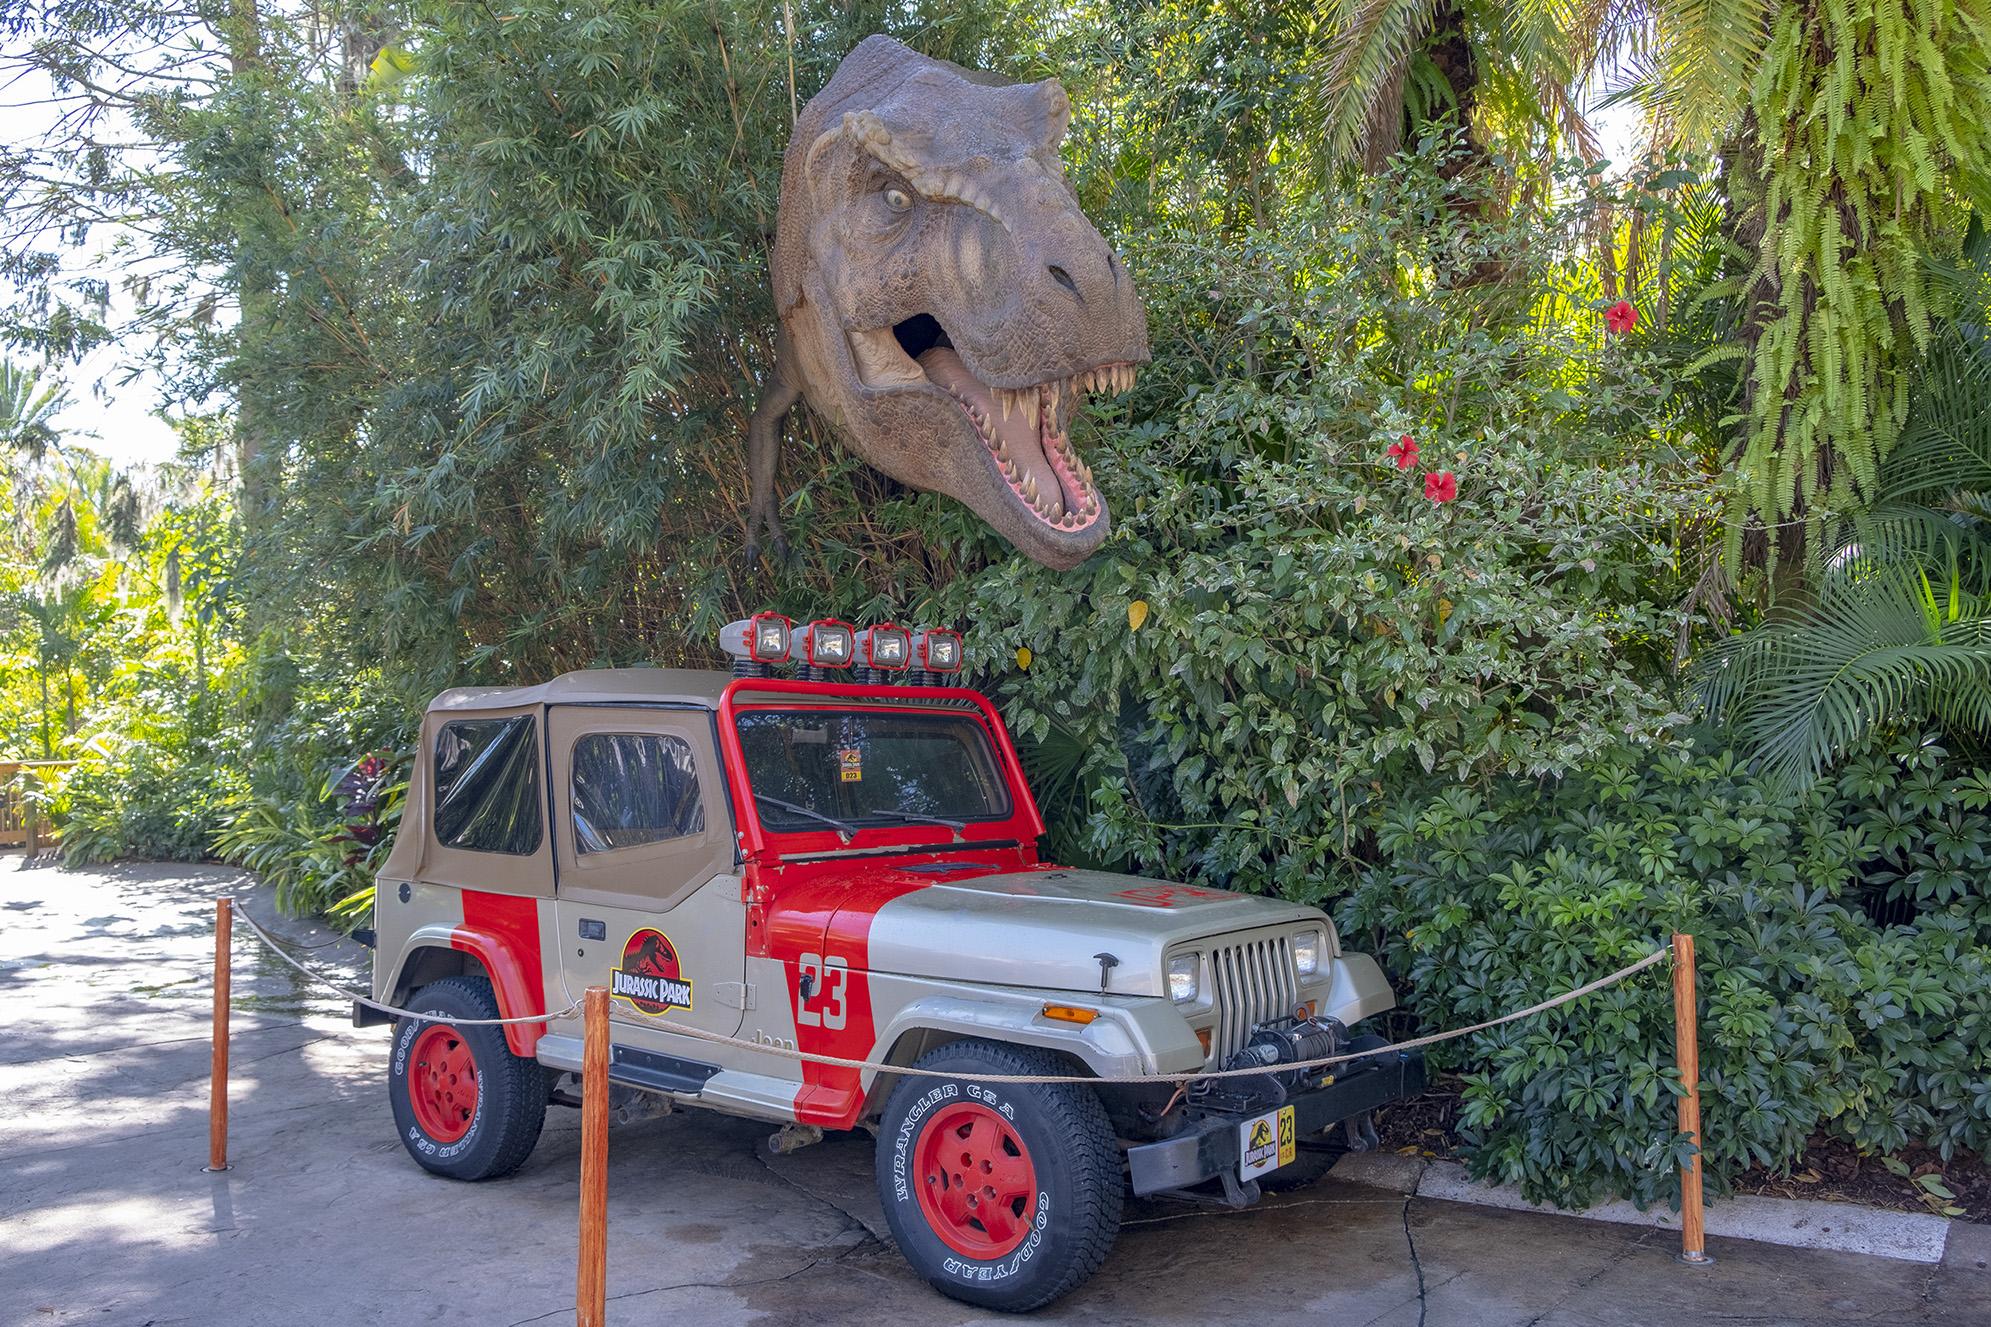 Jurassic Park Islands of Adventure